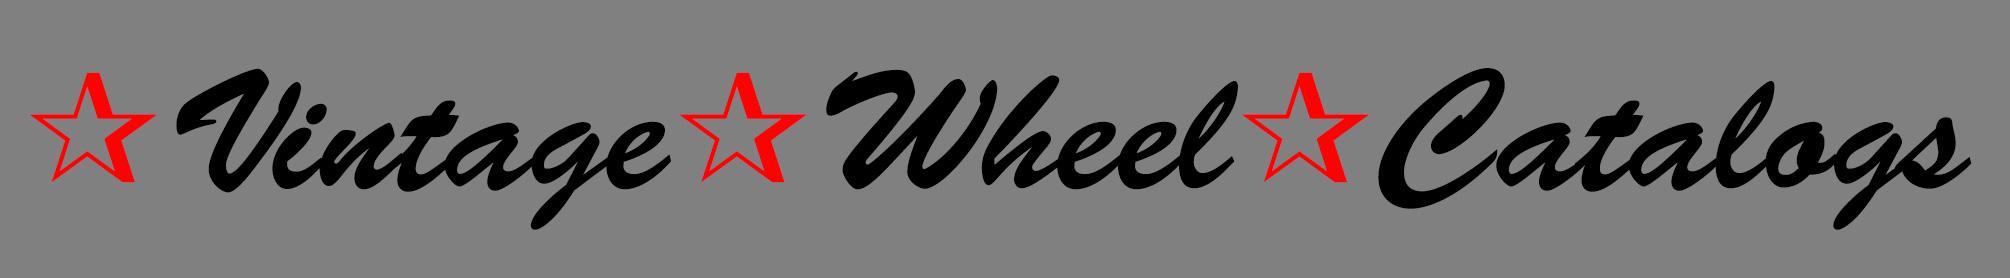 Vintage Wheel Catalogs